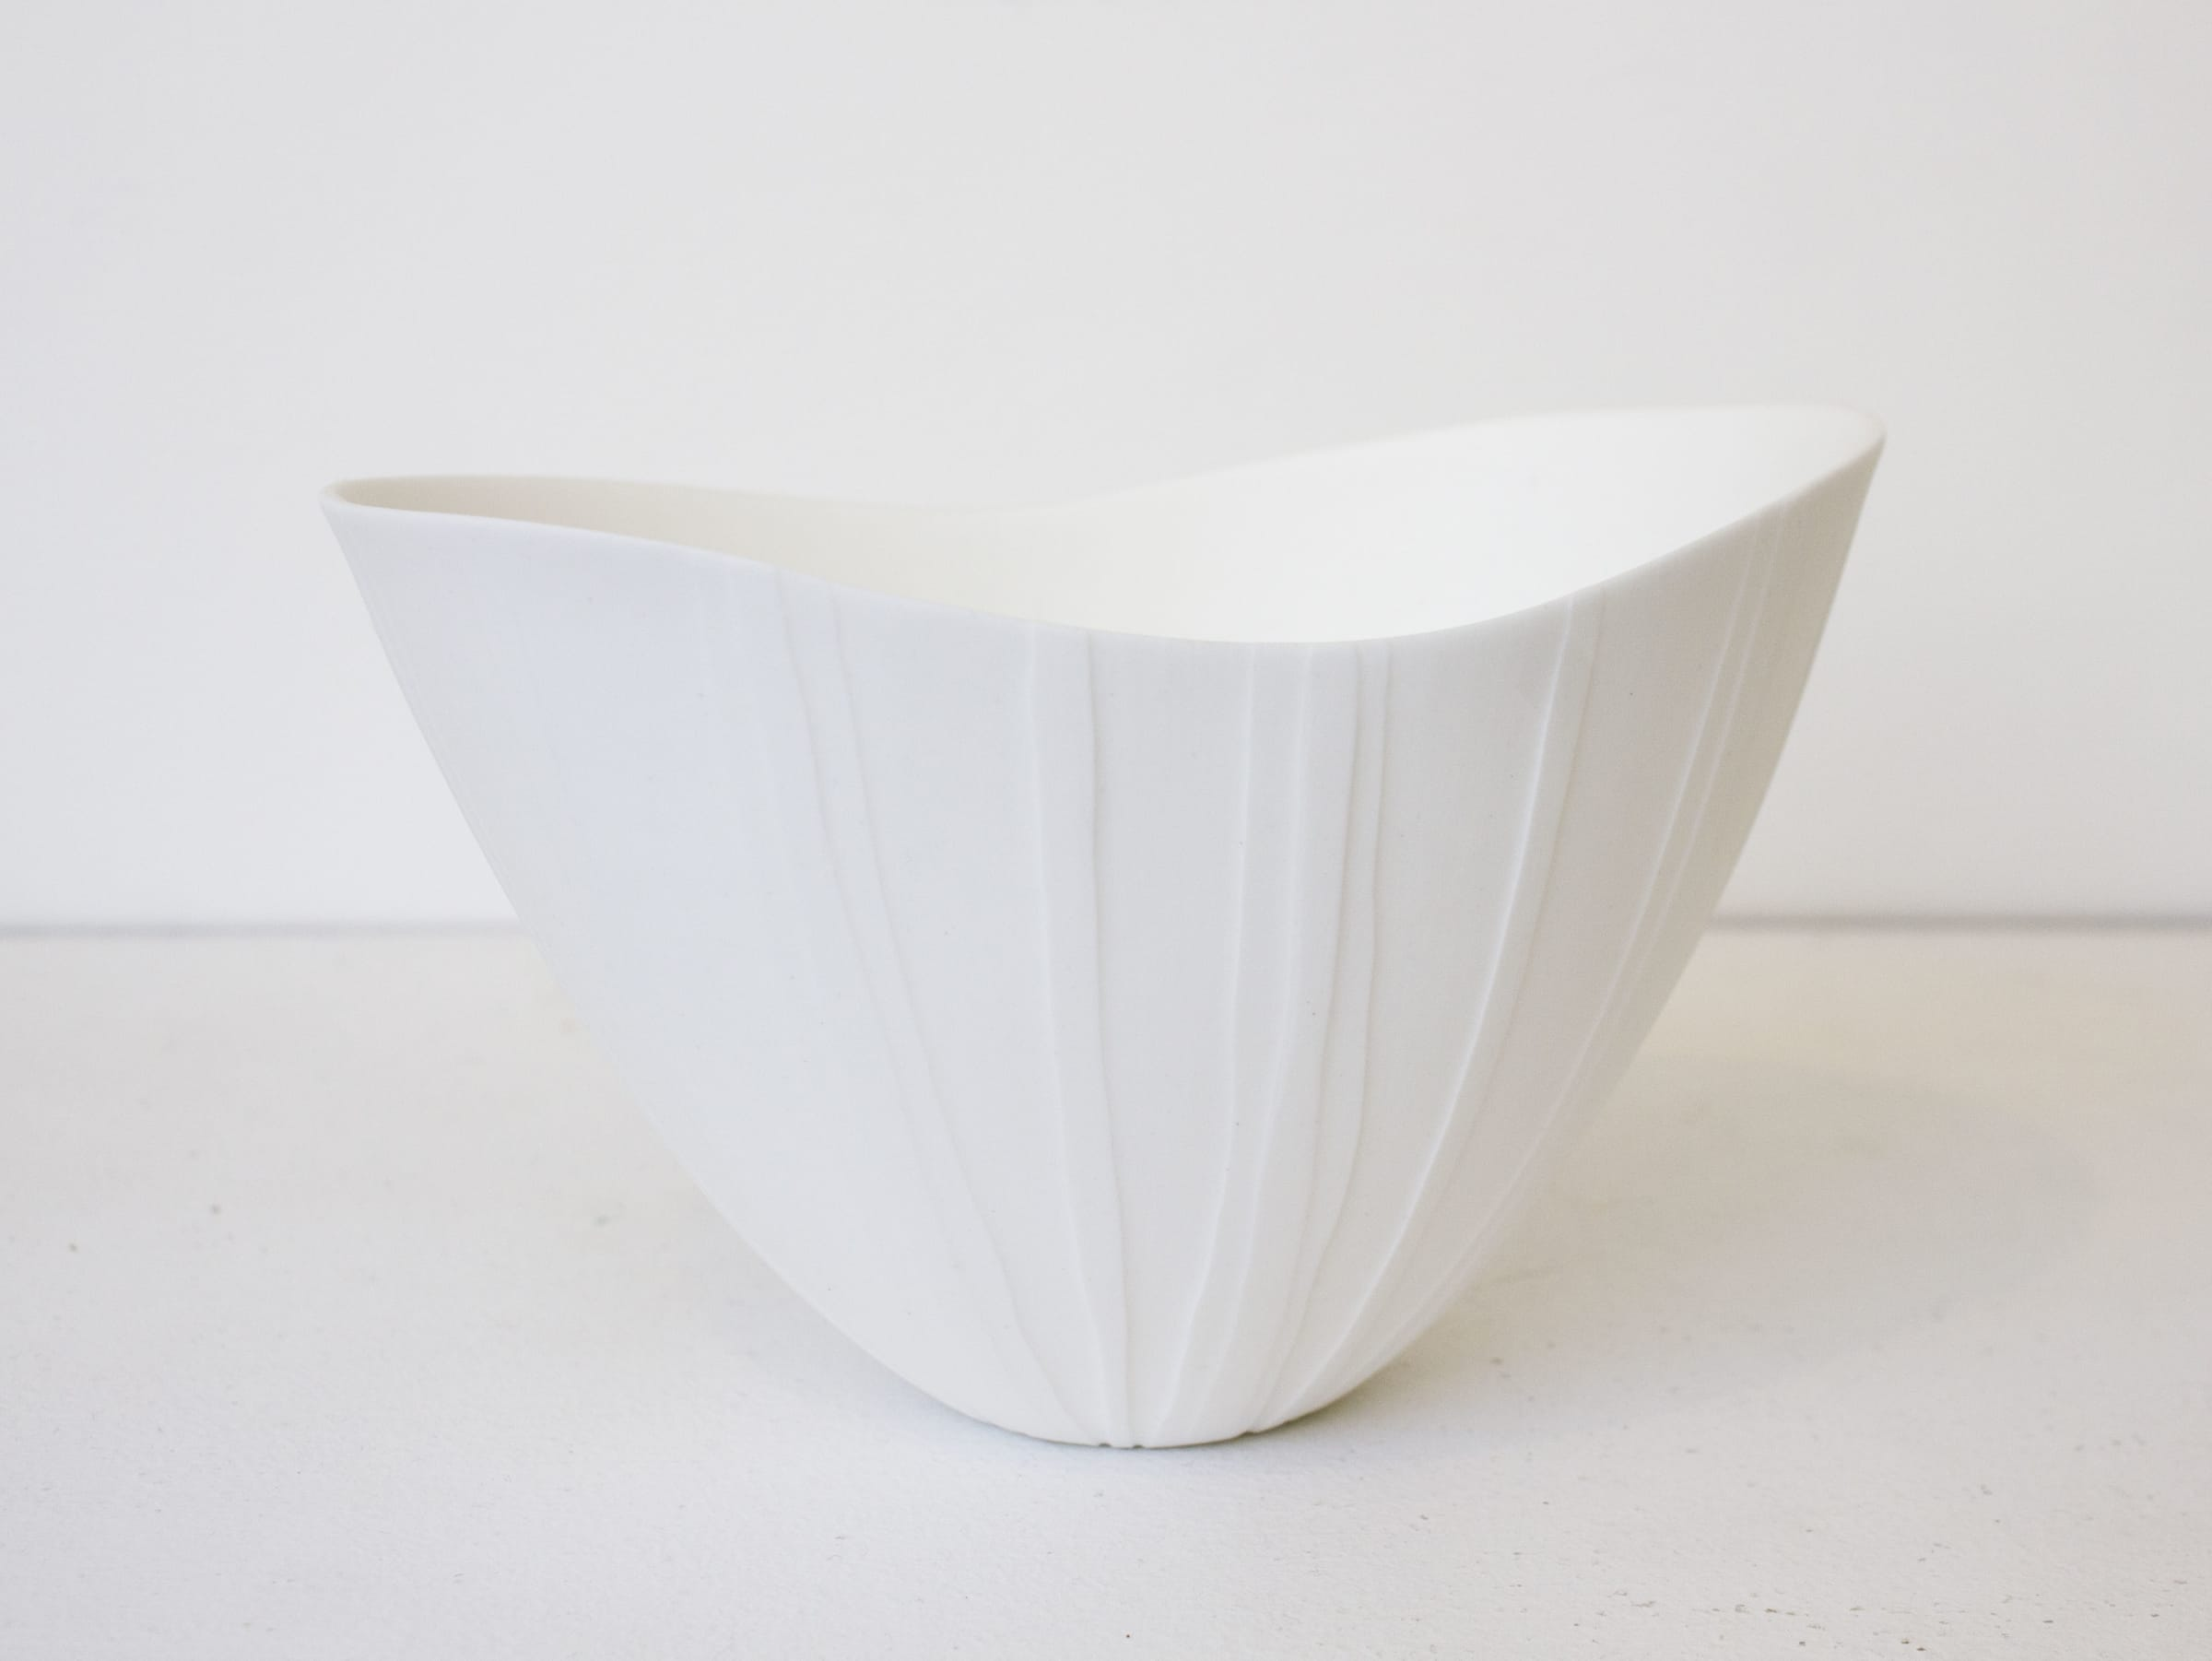 "<span class=""link fancybox-details-link""><a href=""/artists/60-sasha-wardell/works/7790-sasha-wardell-veil-ripple-bowl-2021/"">View Detail Page</a></span><div class=""artist""><strong>Sasha Wardell</strong></div> <div class=""title""><em>'Veil' Ripple Bowl</em>, 2021</div> <div class=""medium"">bone china</div> <div class=""dimensions"">h. 10 cm</div><div class=""price"">£165.00</div><div class=""copyright_line"">Own Art: £16.50 x 10 Months, 0% APR</div>"